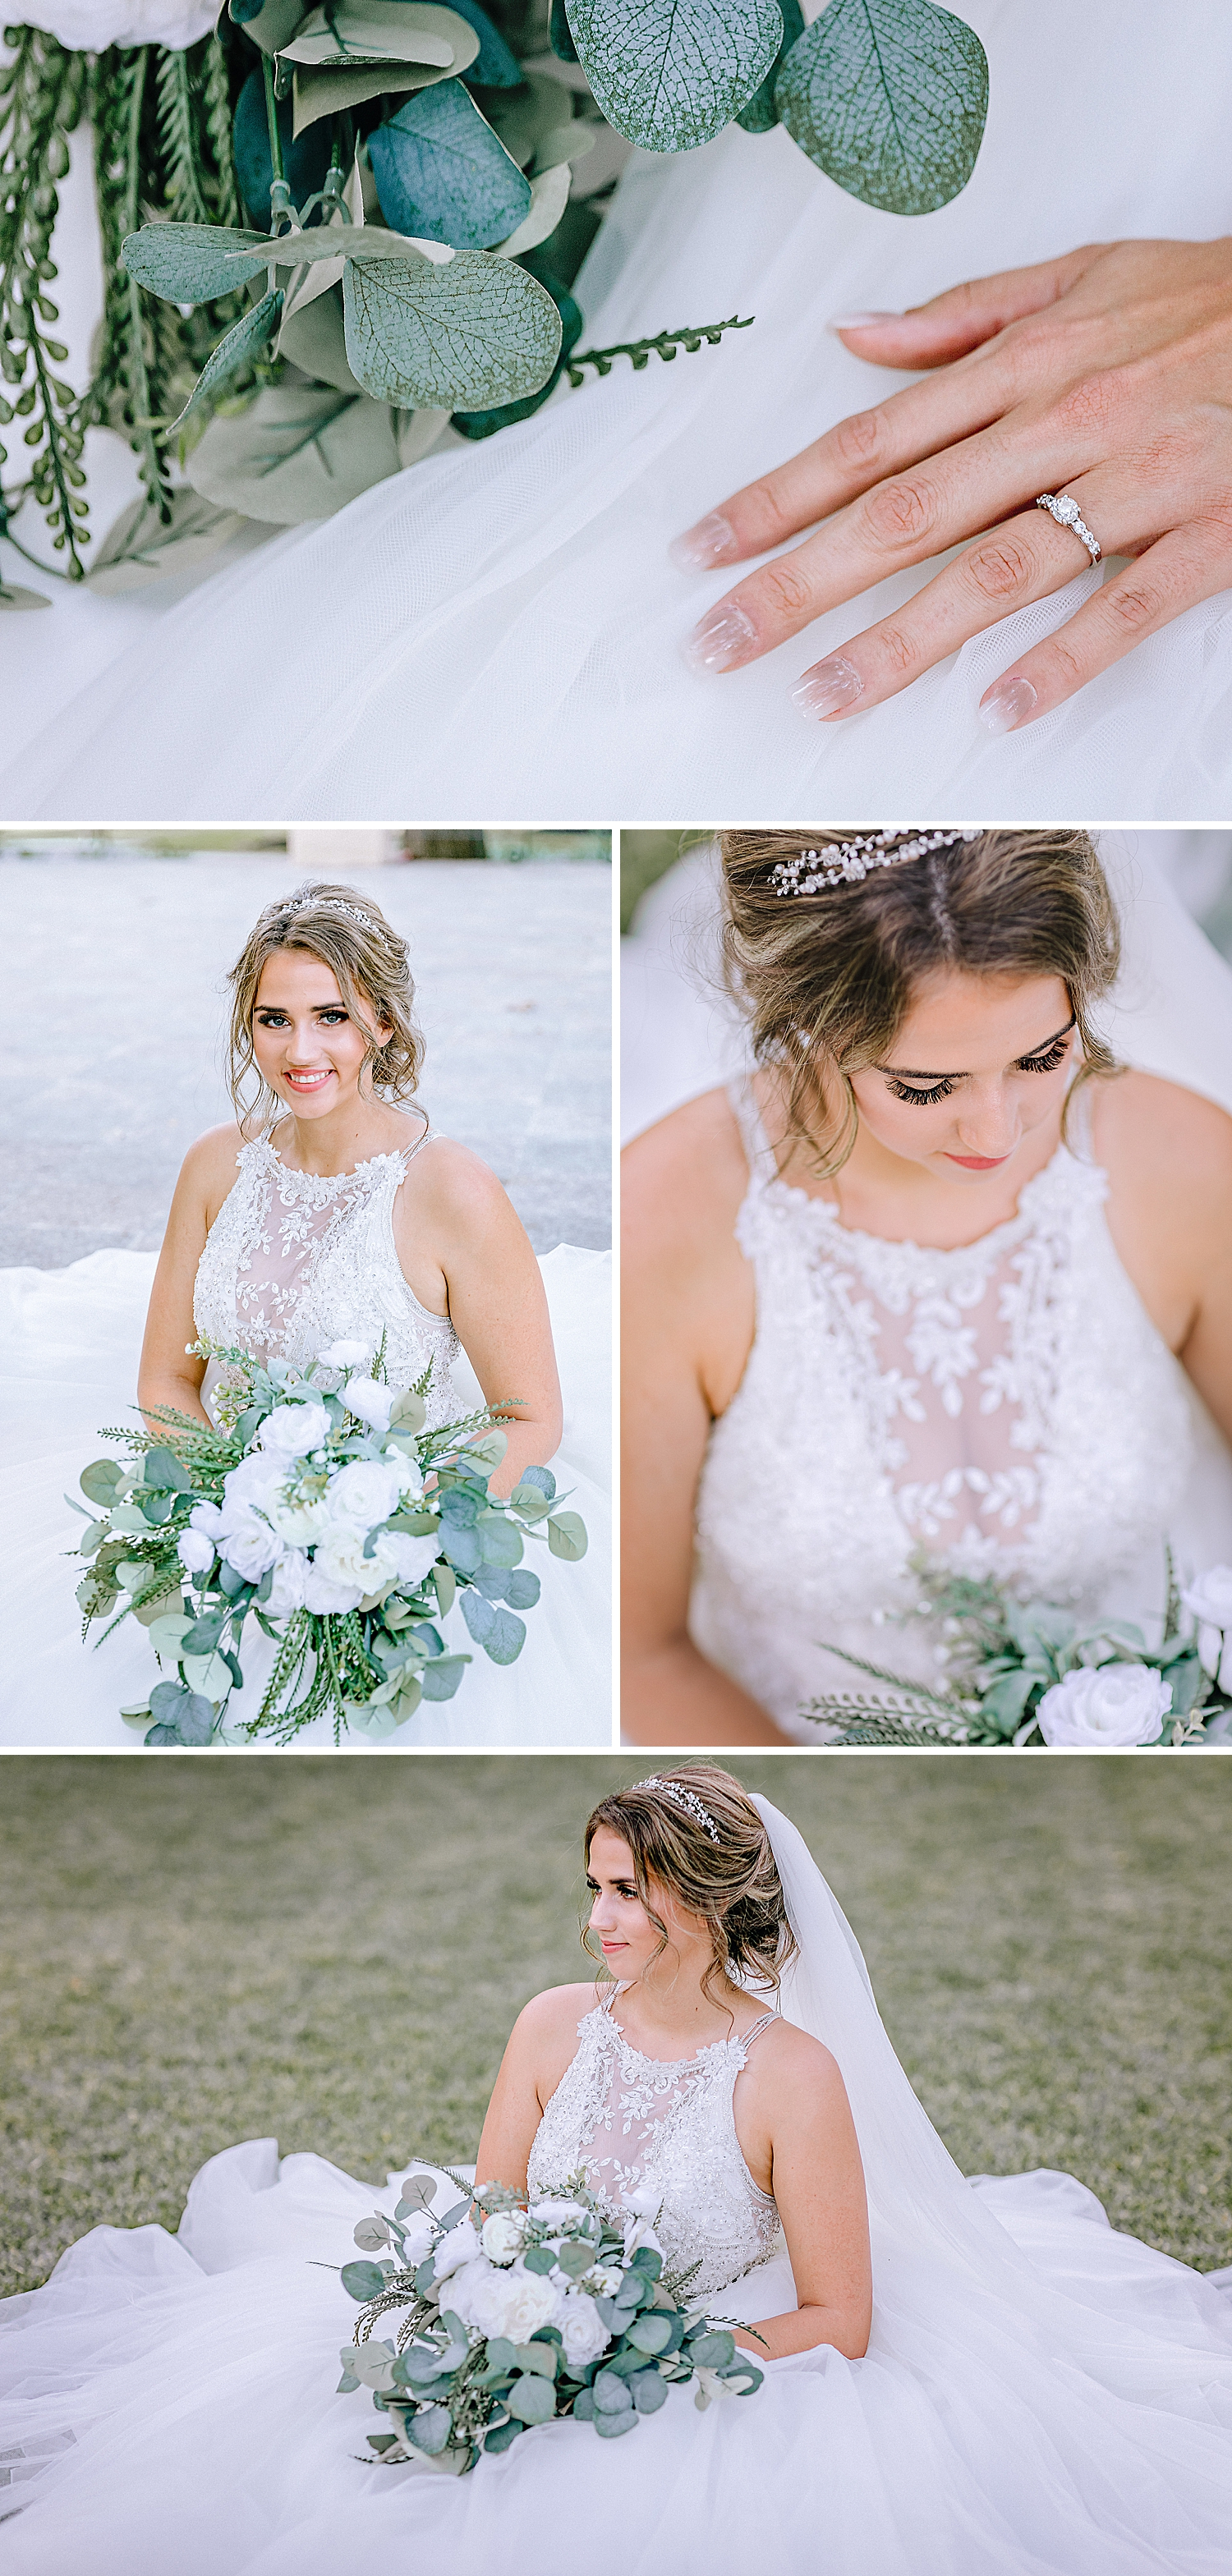 San-Antonio-Weddings-Bridal-Photos-Carly-Barton-Photography_0017.jpg